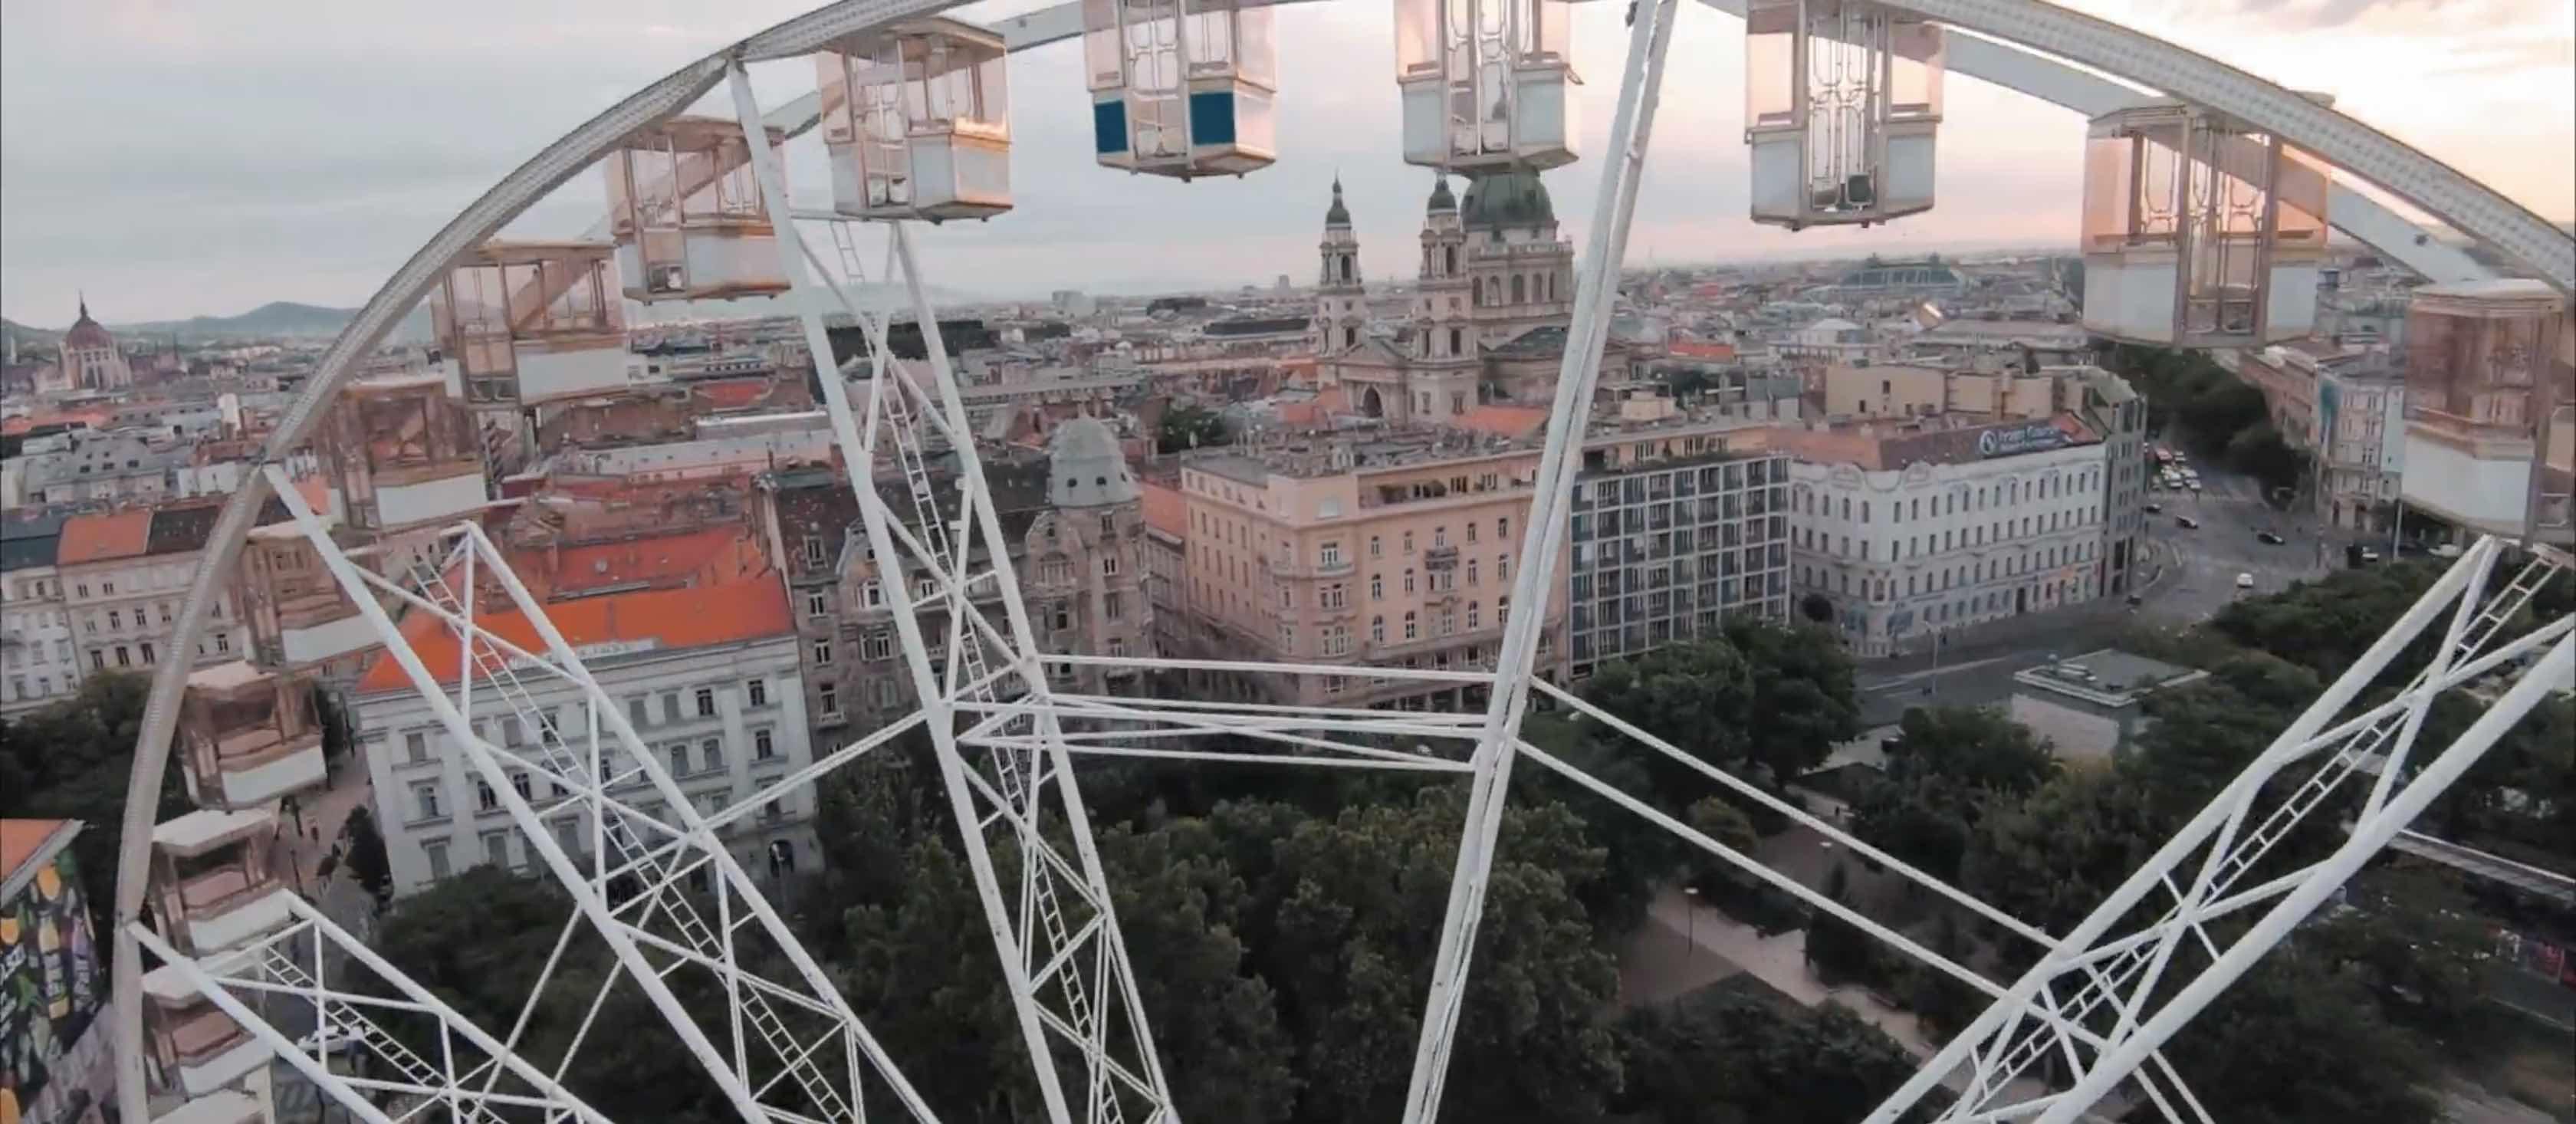 budapest-fpbdrone-videooszkarbabics.jpg